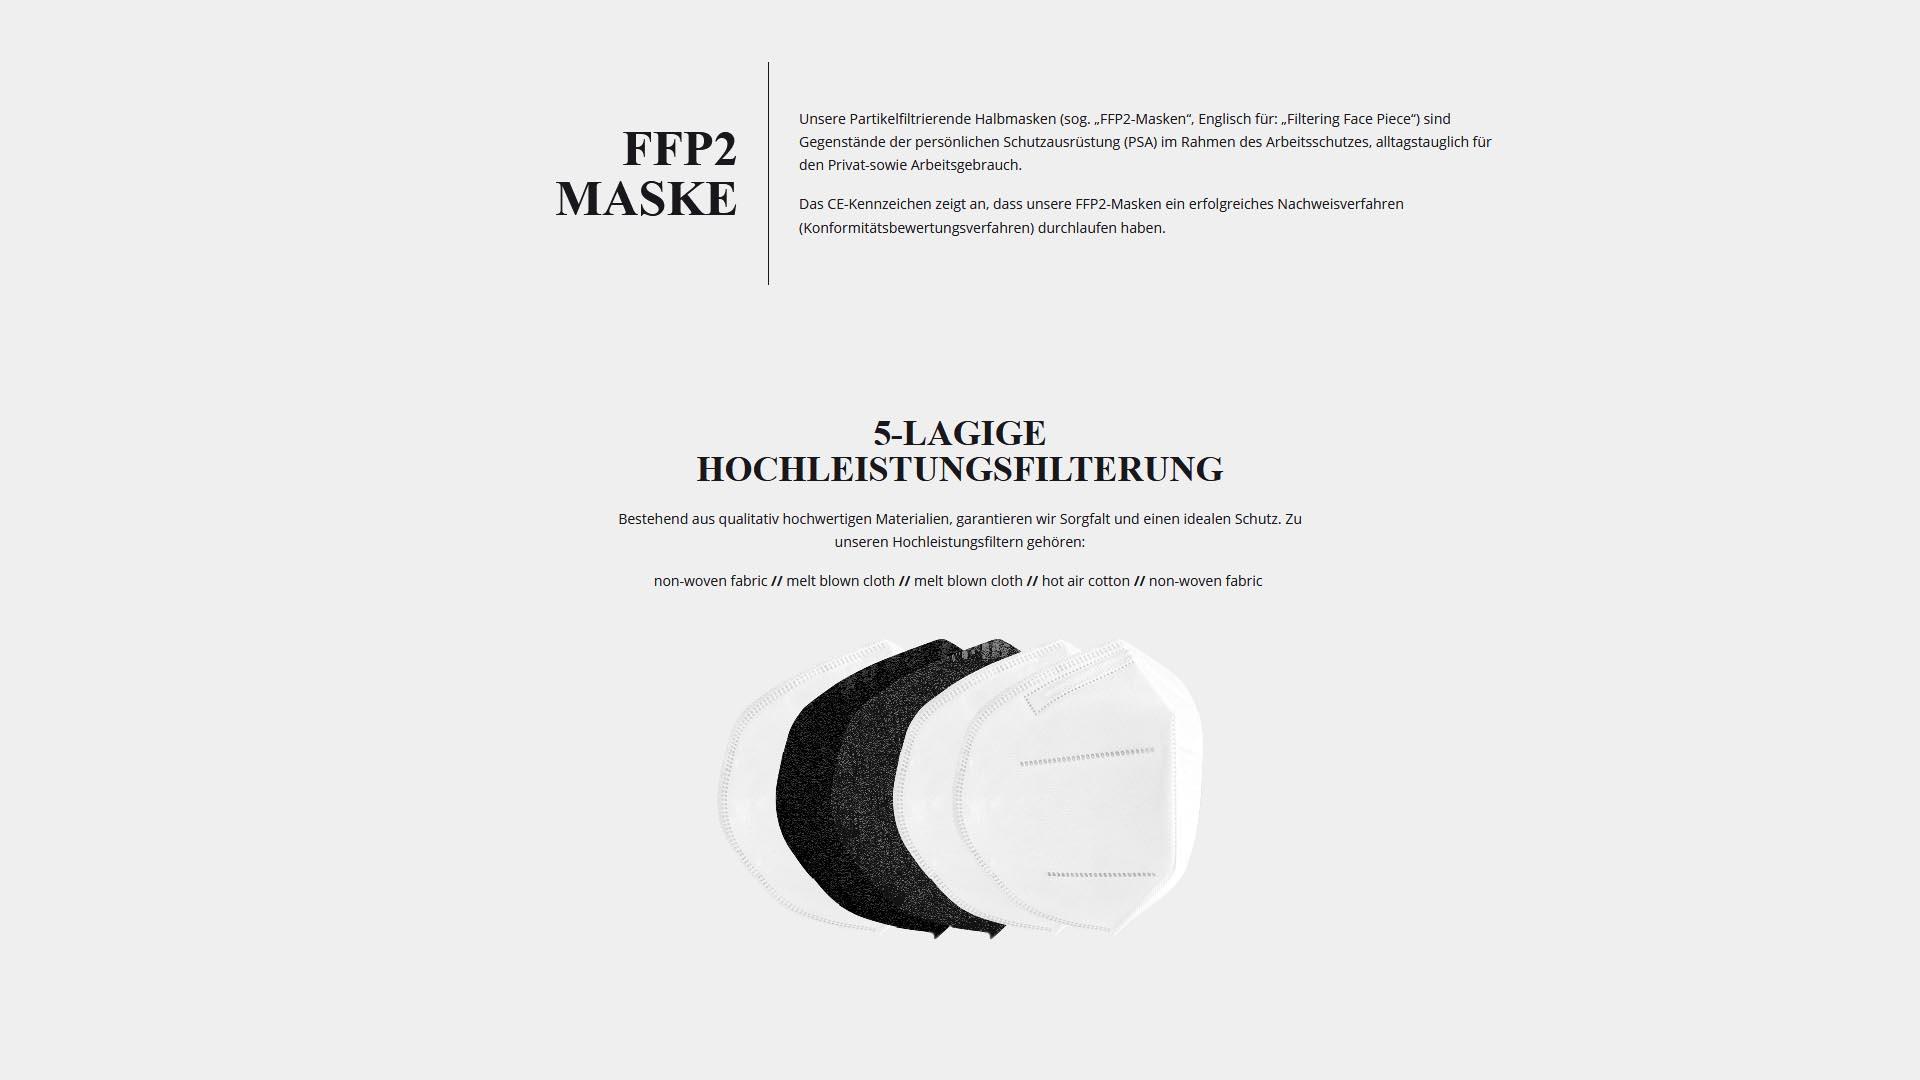 msk industrieservice atemschutzmasken ffp2 relaunch 6